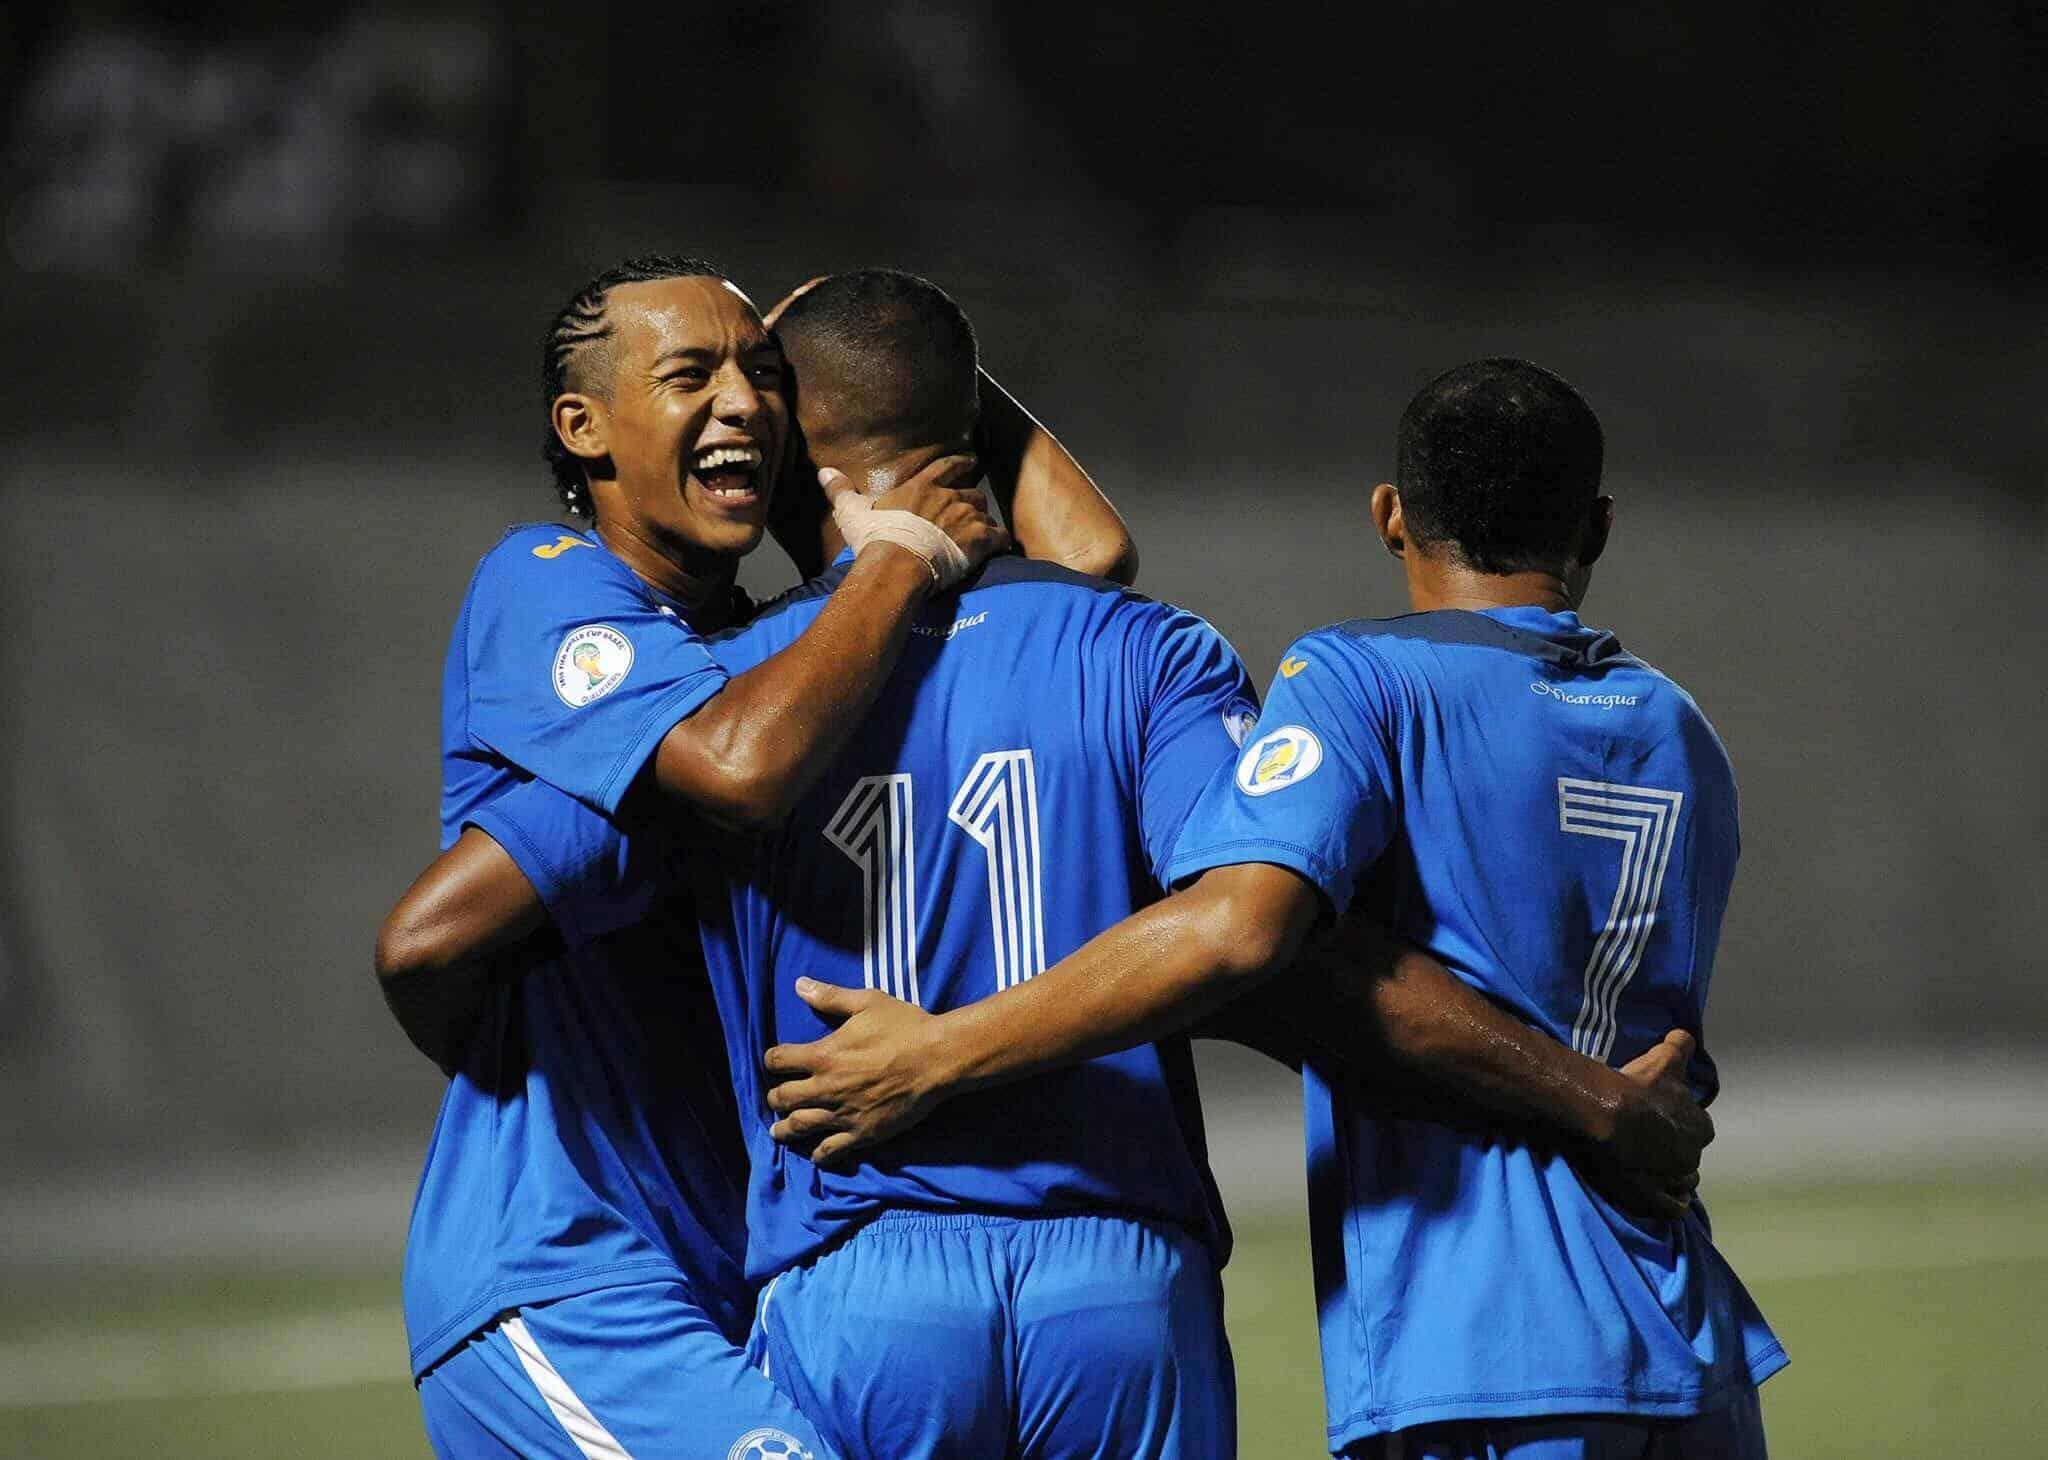 NICARAGUA NATIONAL FC SOCCER TEAM 2019